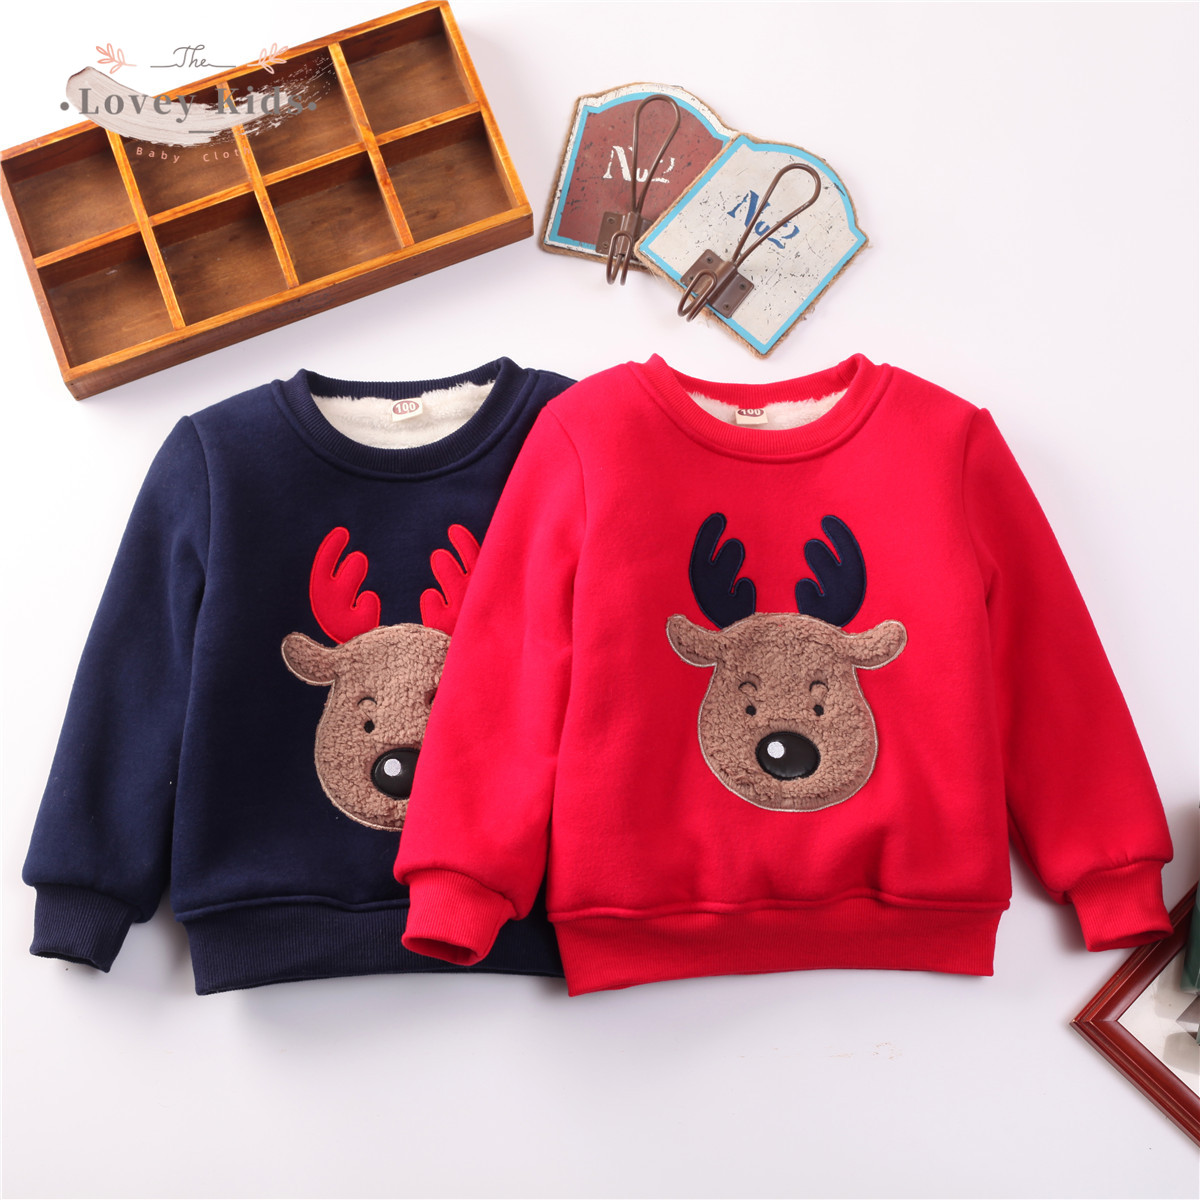 2020 Baby Girl Boy Sweatshirts Pullover Christmas Xmas Deer Print Winter Warmer Long Sleeve Tops Kids Clothes  Unisex Costume 1